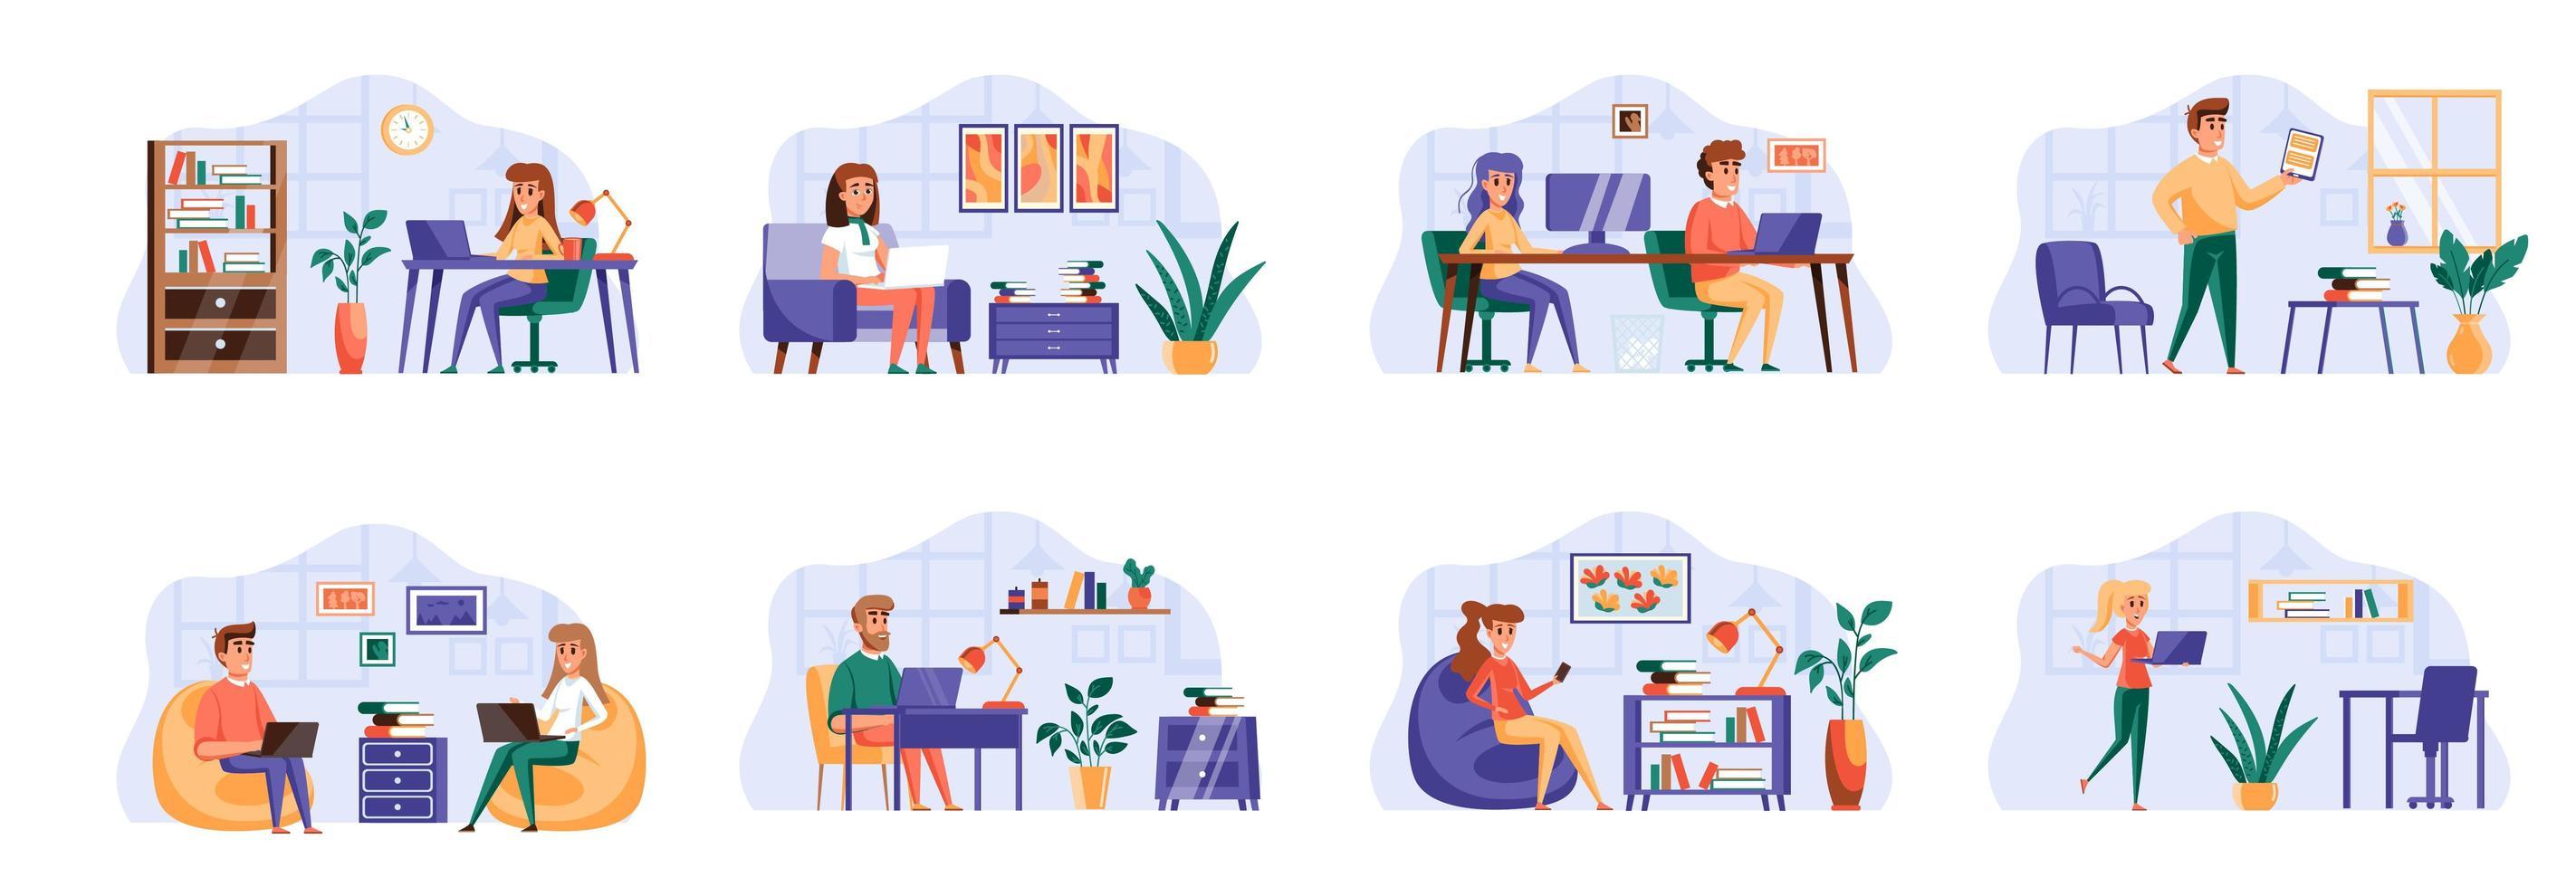 coworking office-bundel met personagekarakters. vector